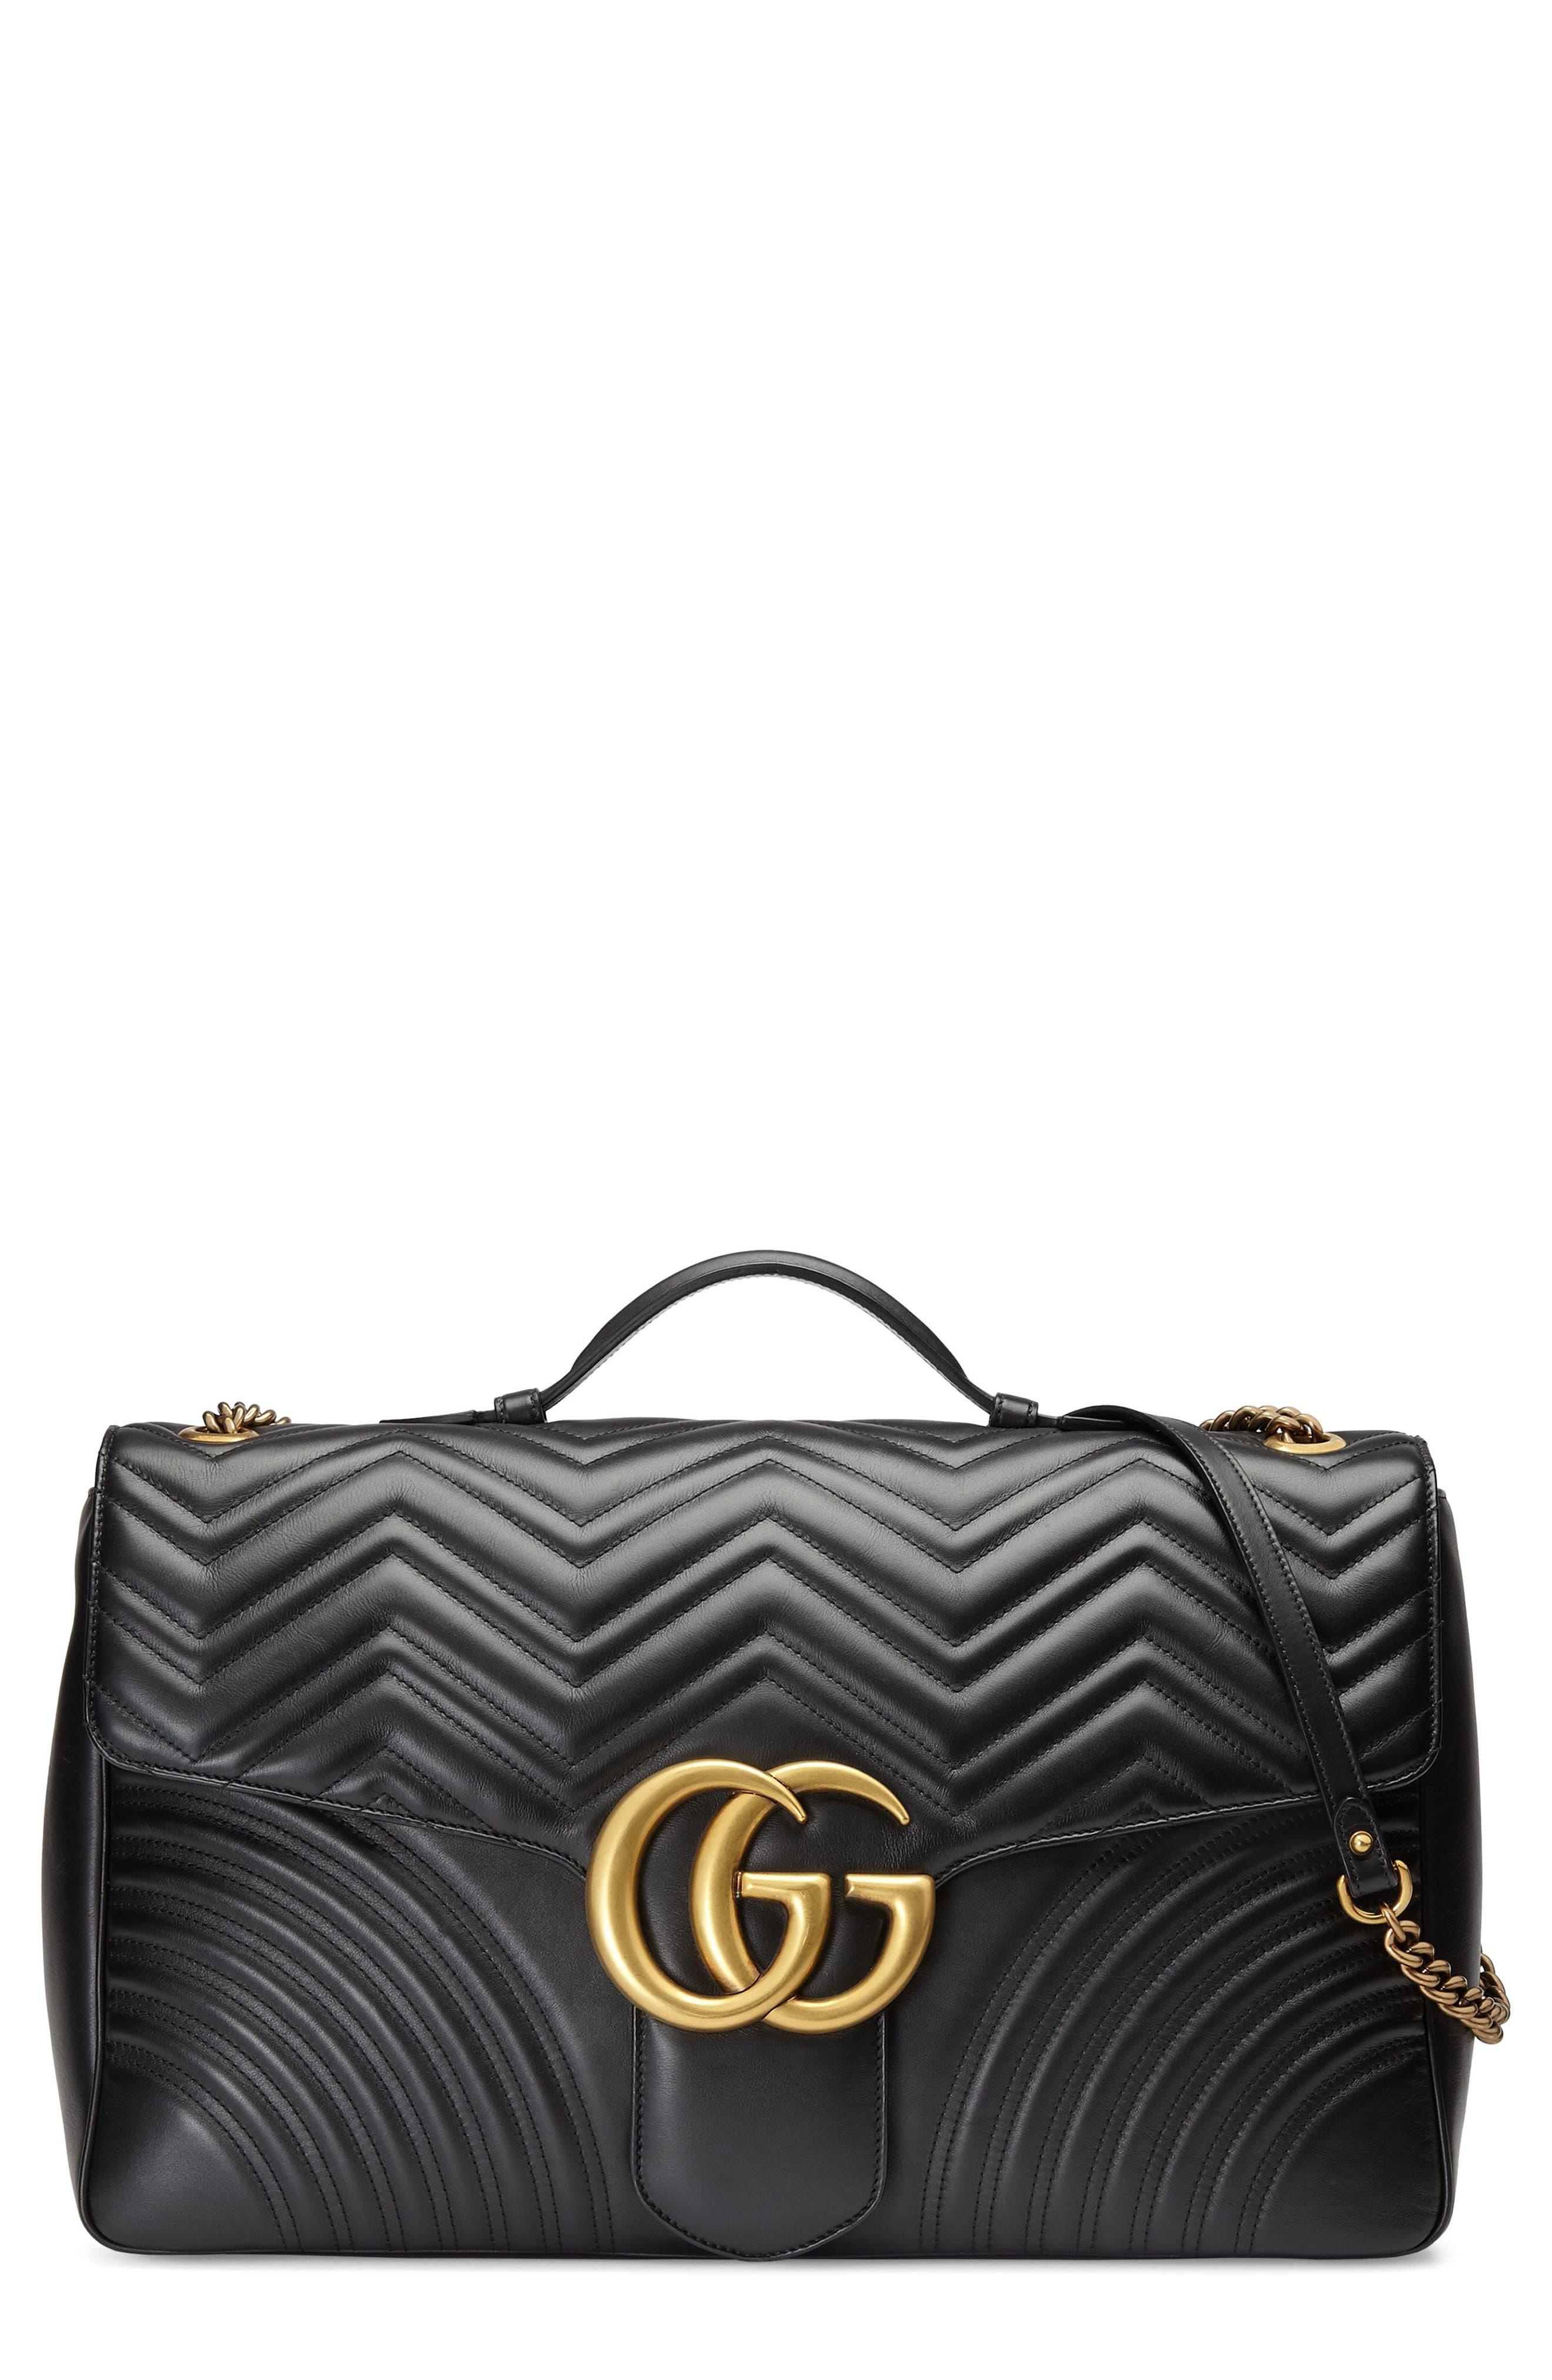 Alternate Image 1 Selected - Gucci GG Marmont Maxi Matelassé Top Handle Shoulder Bag